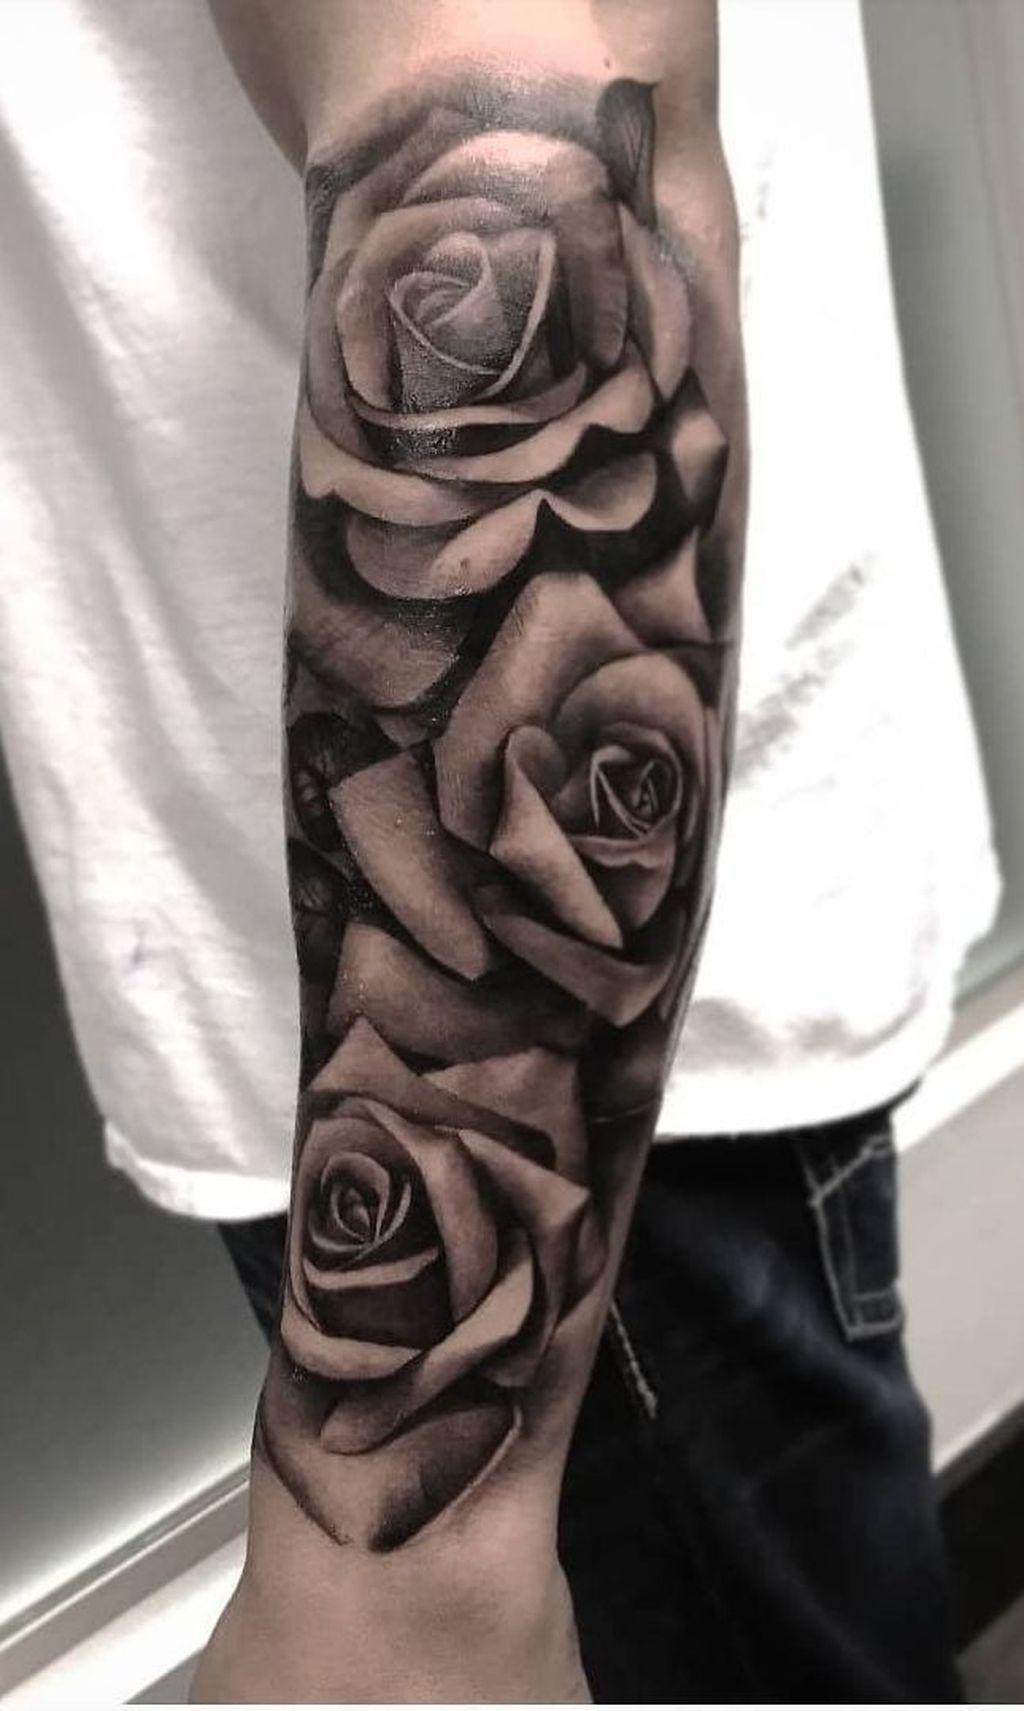 30 Classy Sleeve Tattoo Design Ideas To Inspire For Women Rose Tattoos For Men Hand Tattoos For Women Rose Tattoo Design